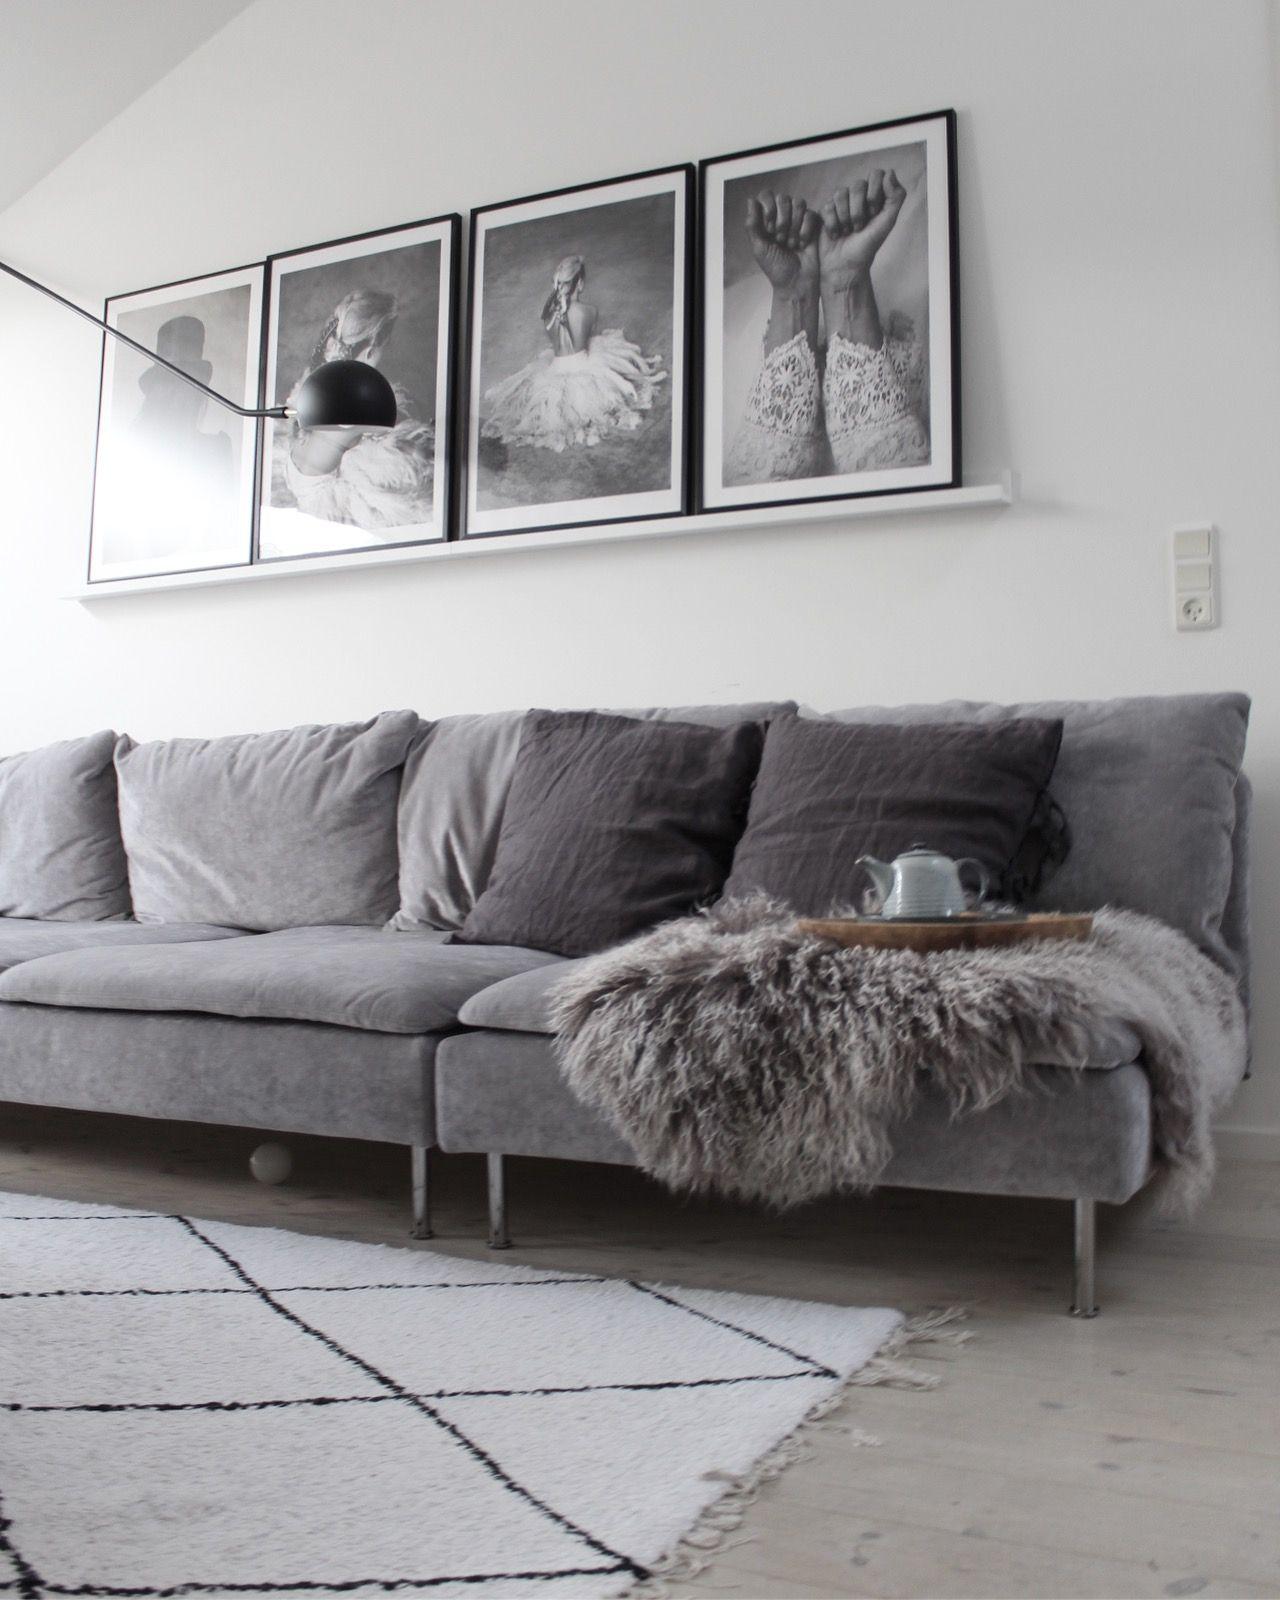 Cool Scandinavian Inspired Living Room With A Grey Velvet Sofa Black And White Photo Art Beni Ou Living Room Scandinavian Grey Velvet Sofa Living Room Grey